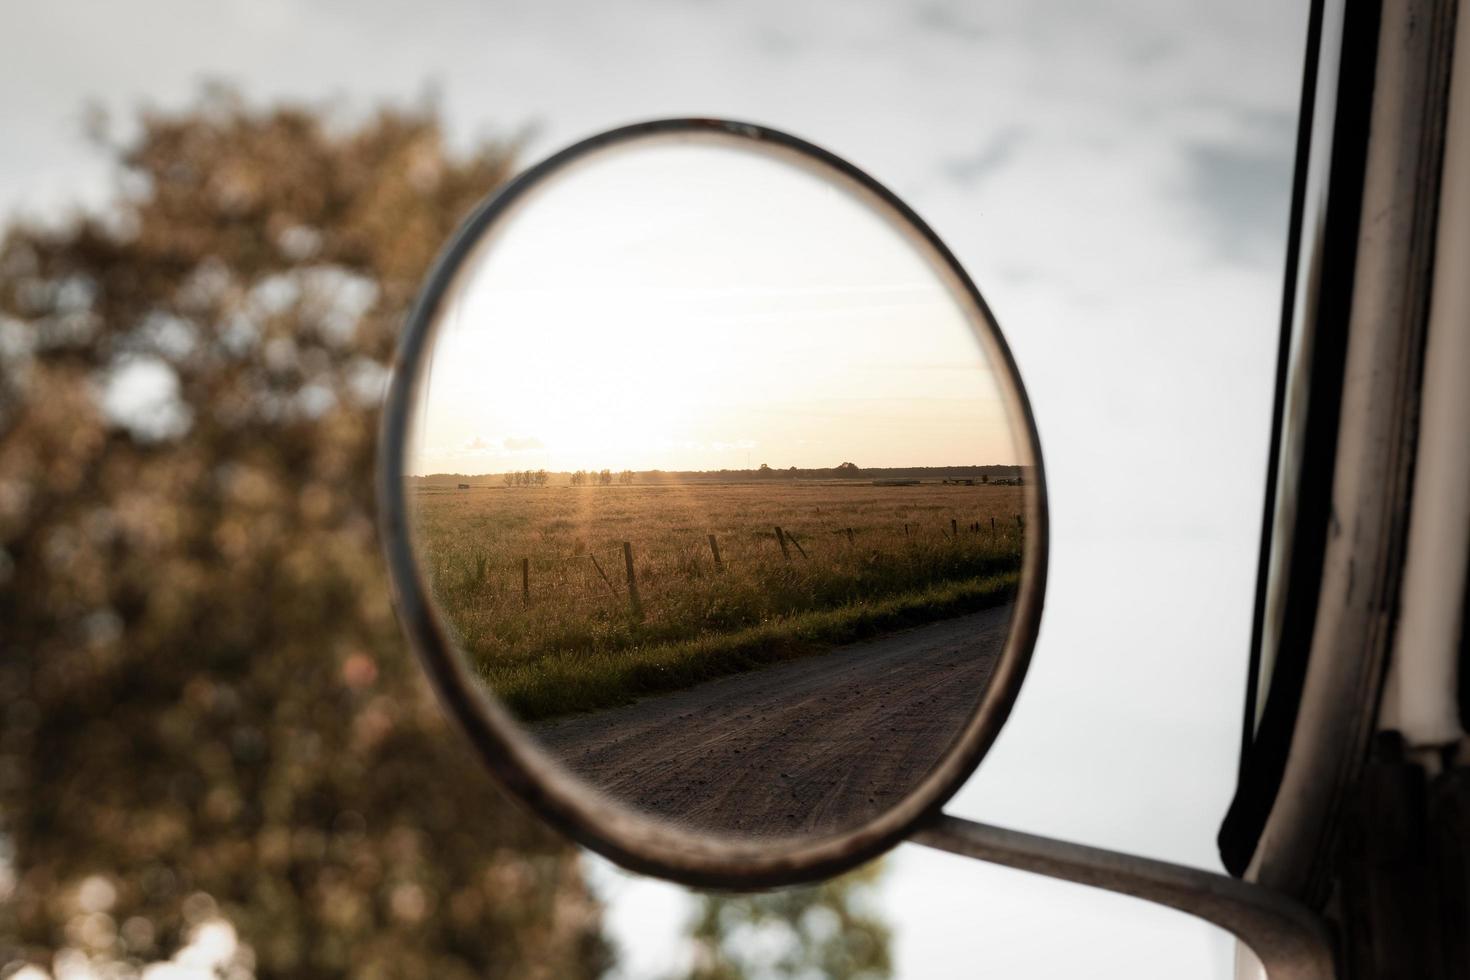 fordons sidospegel foto